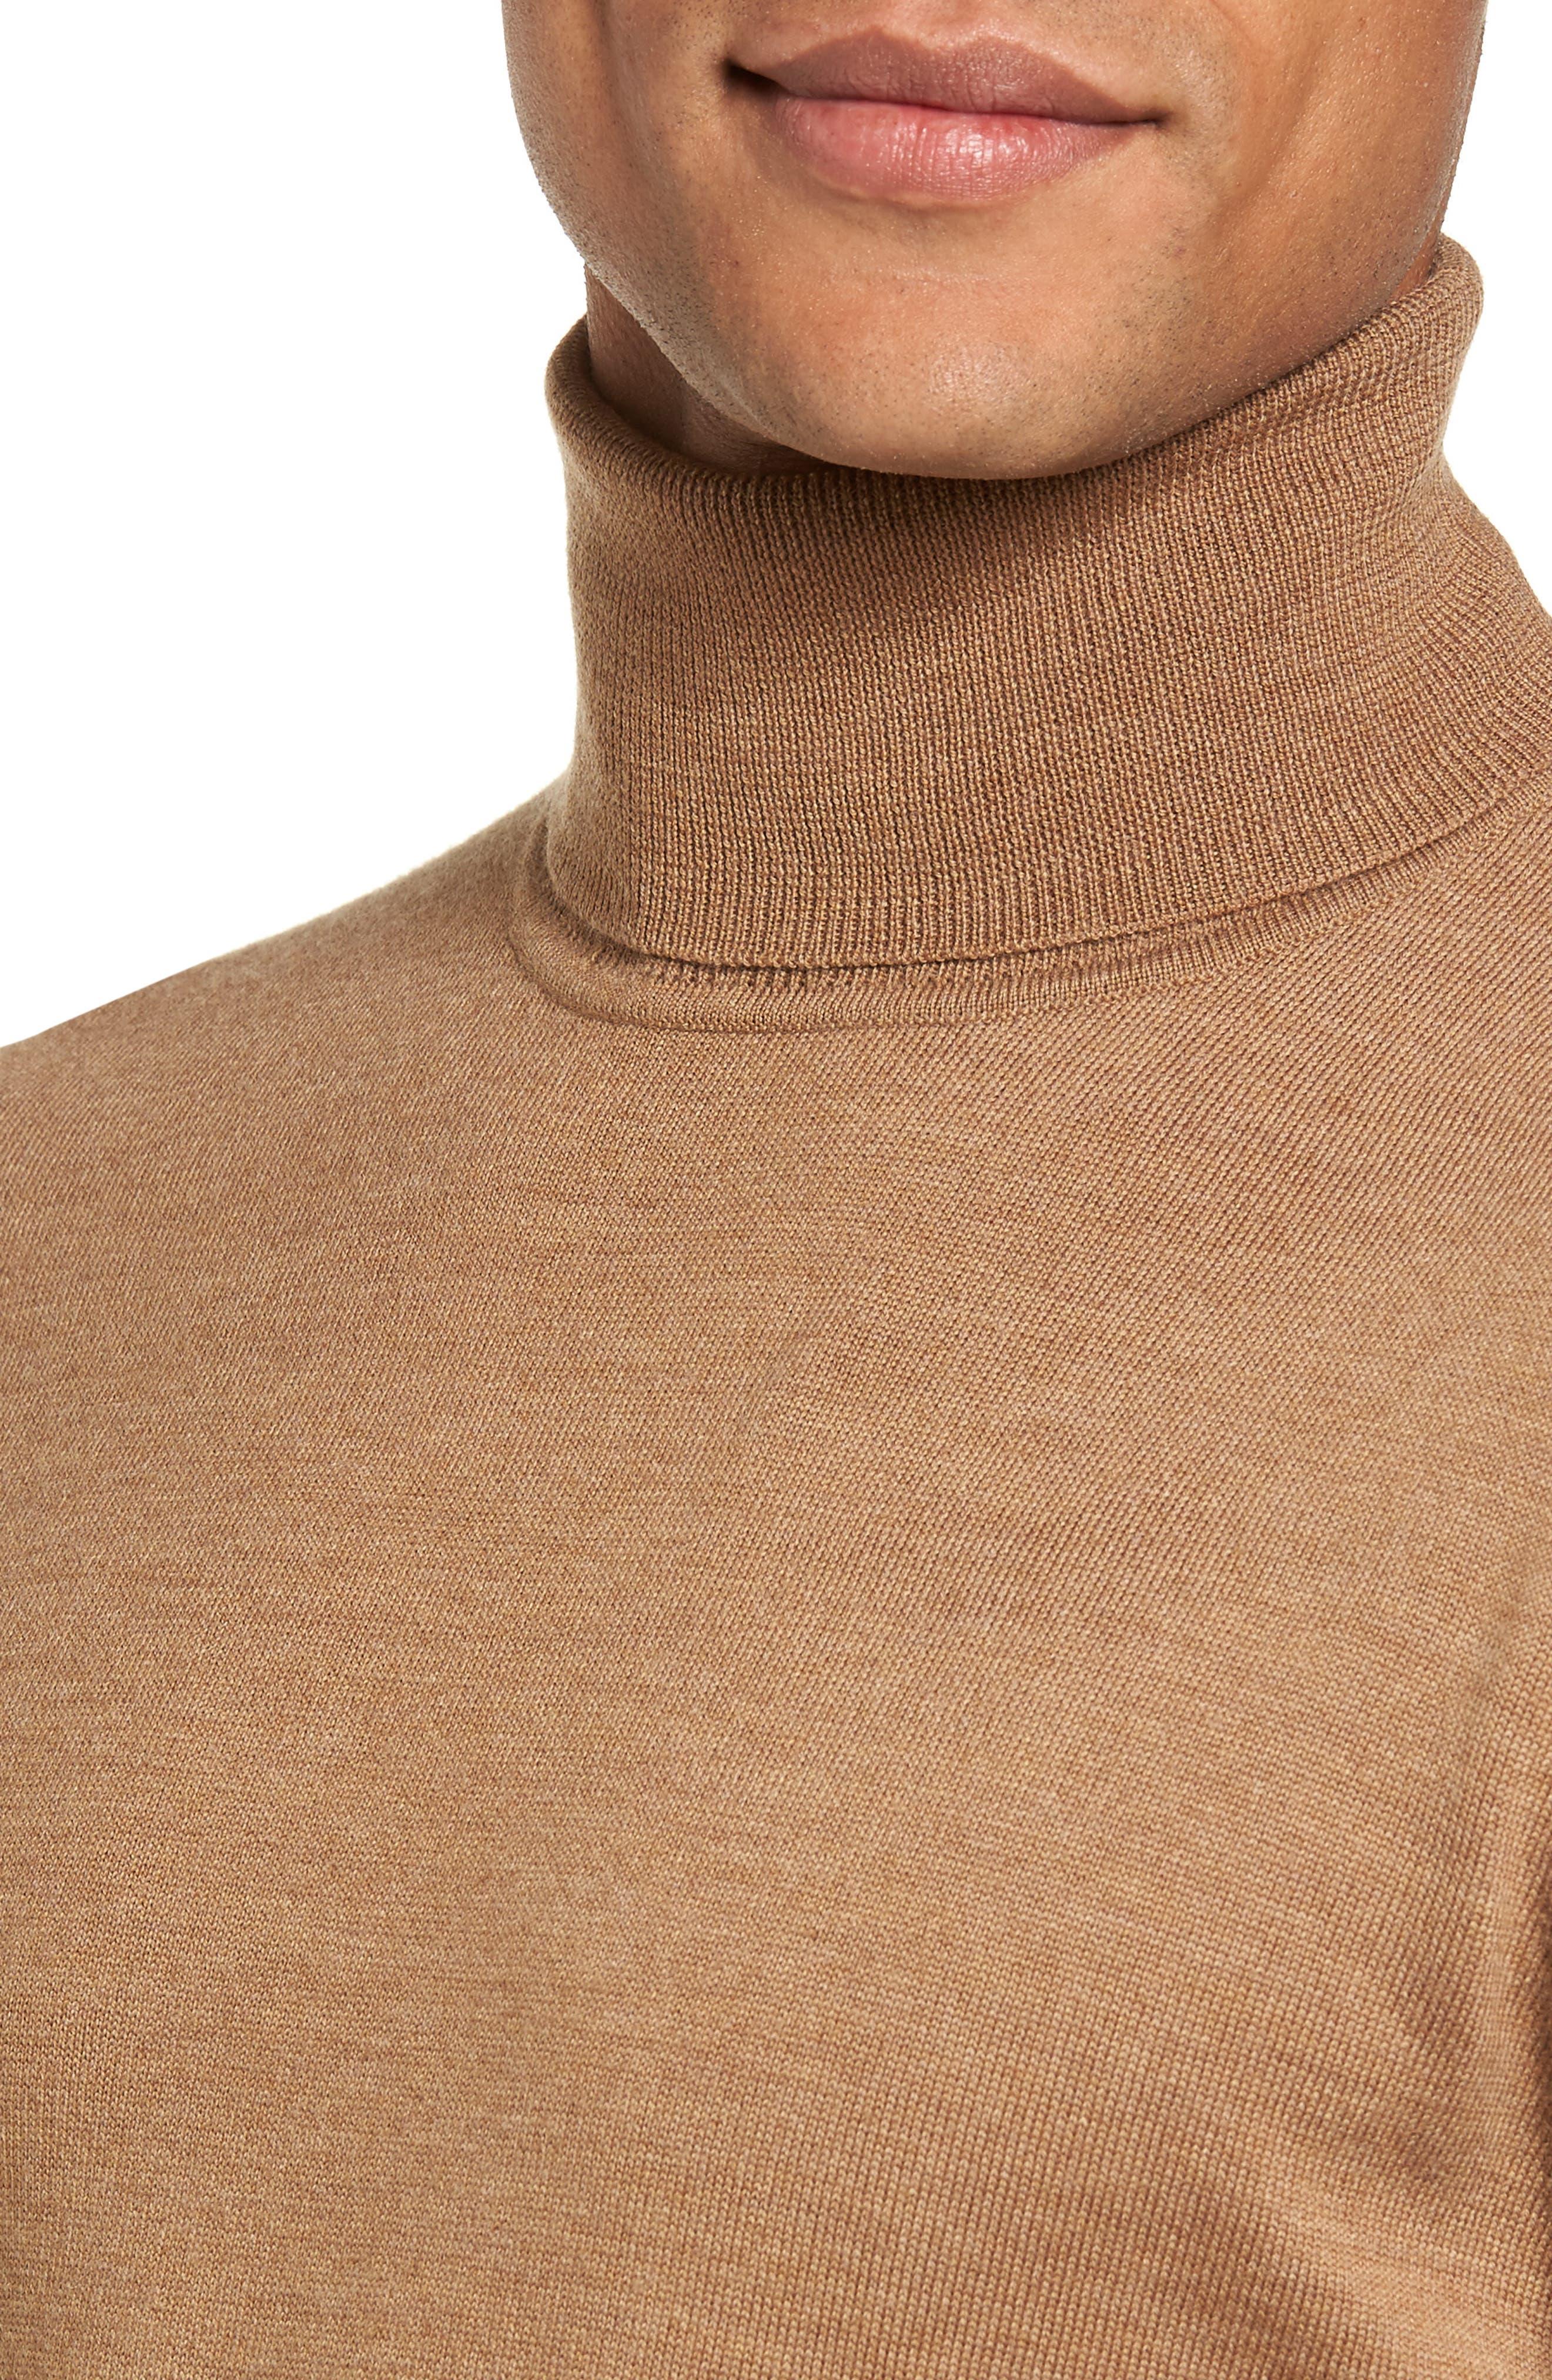 Merino Wool Turtleneck Sweater,                             Alternate thumbnail 22, color,